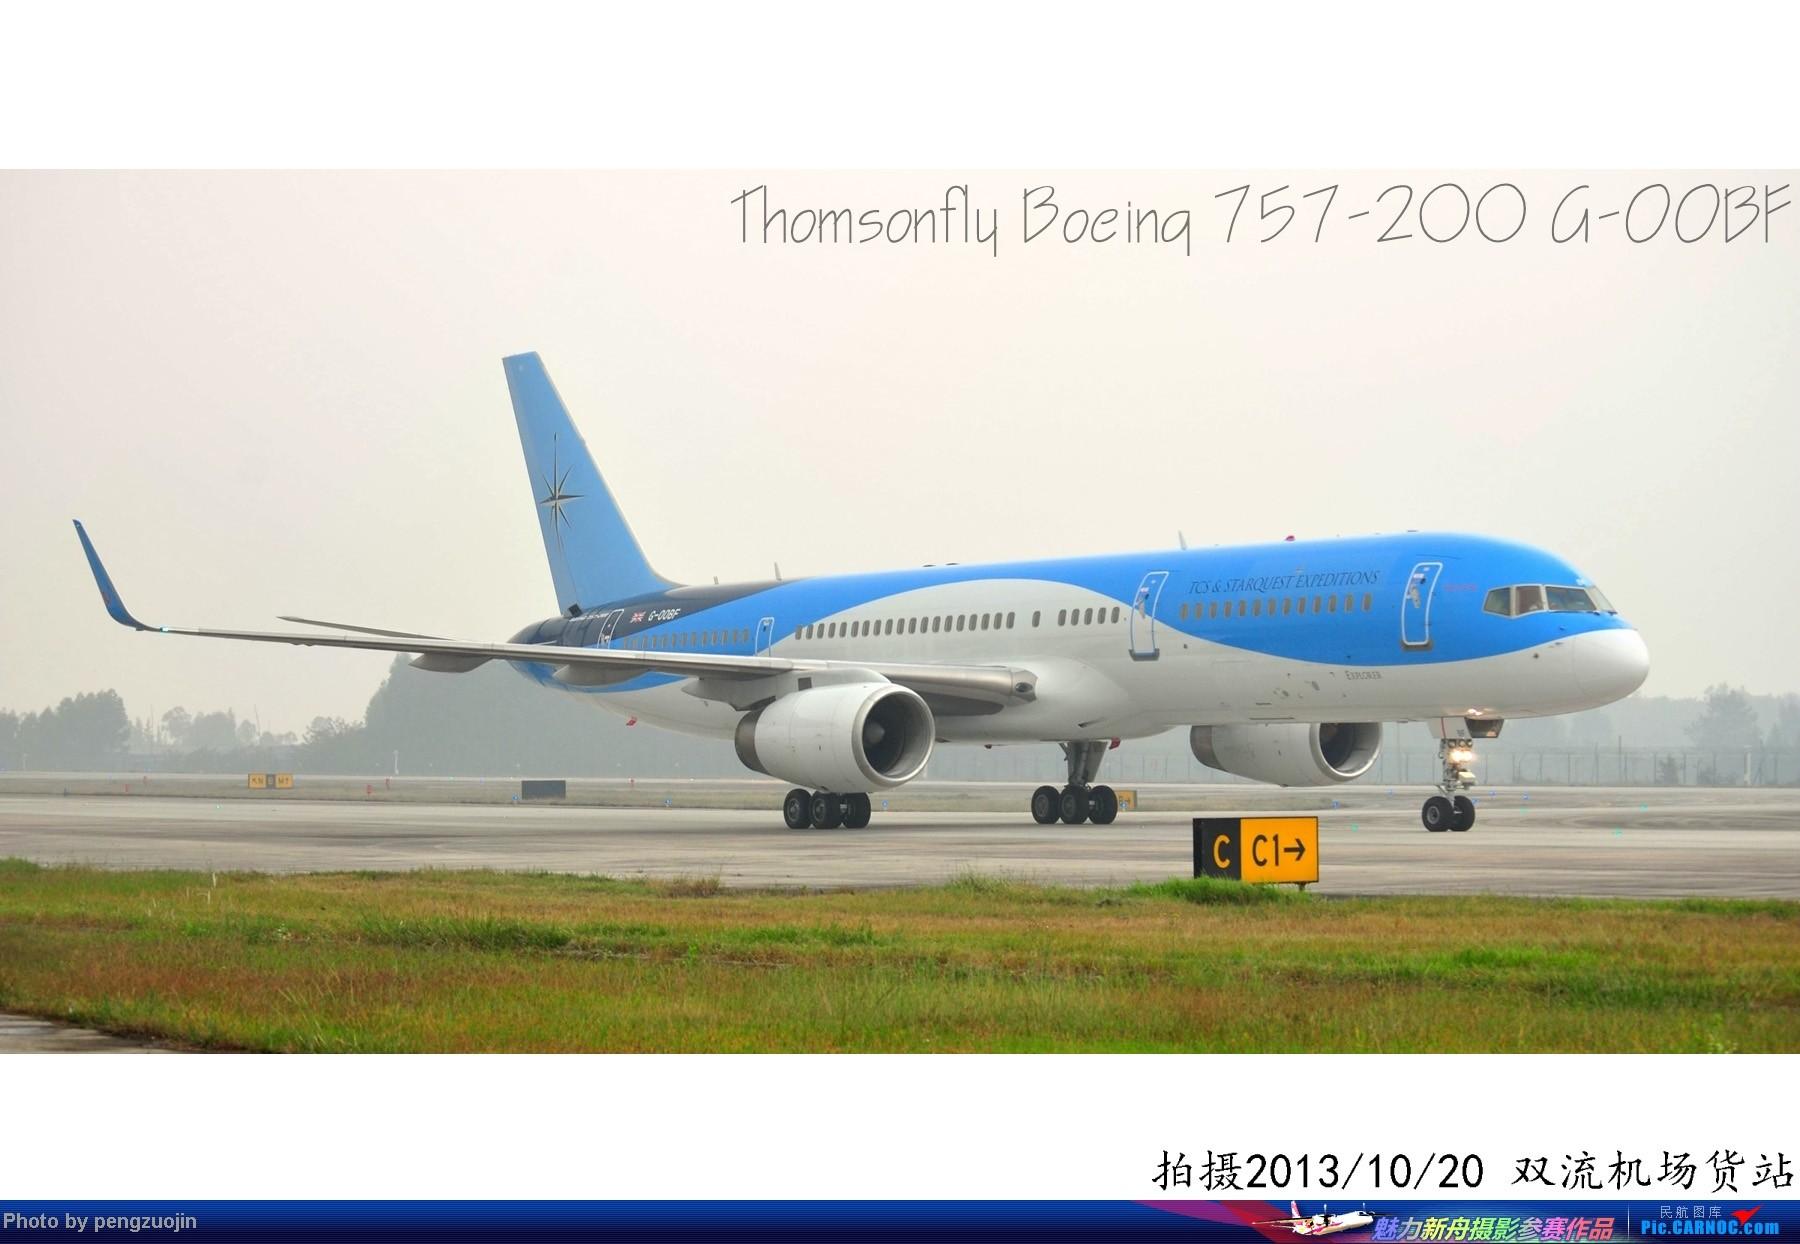 Re:[原创]【成都飞友会】悍马 Thomsonfly BOEING 757-200 G-OOBF CTU